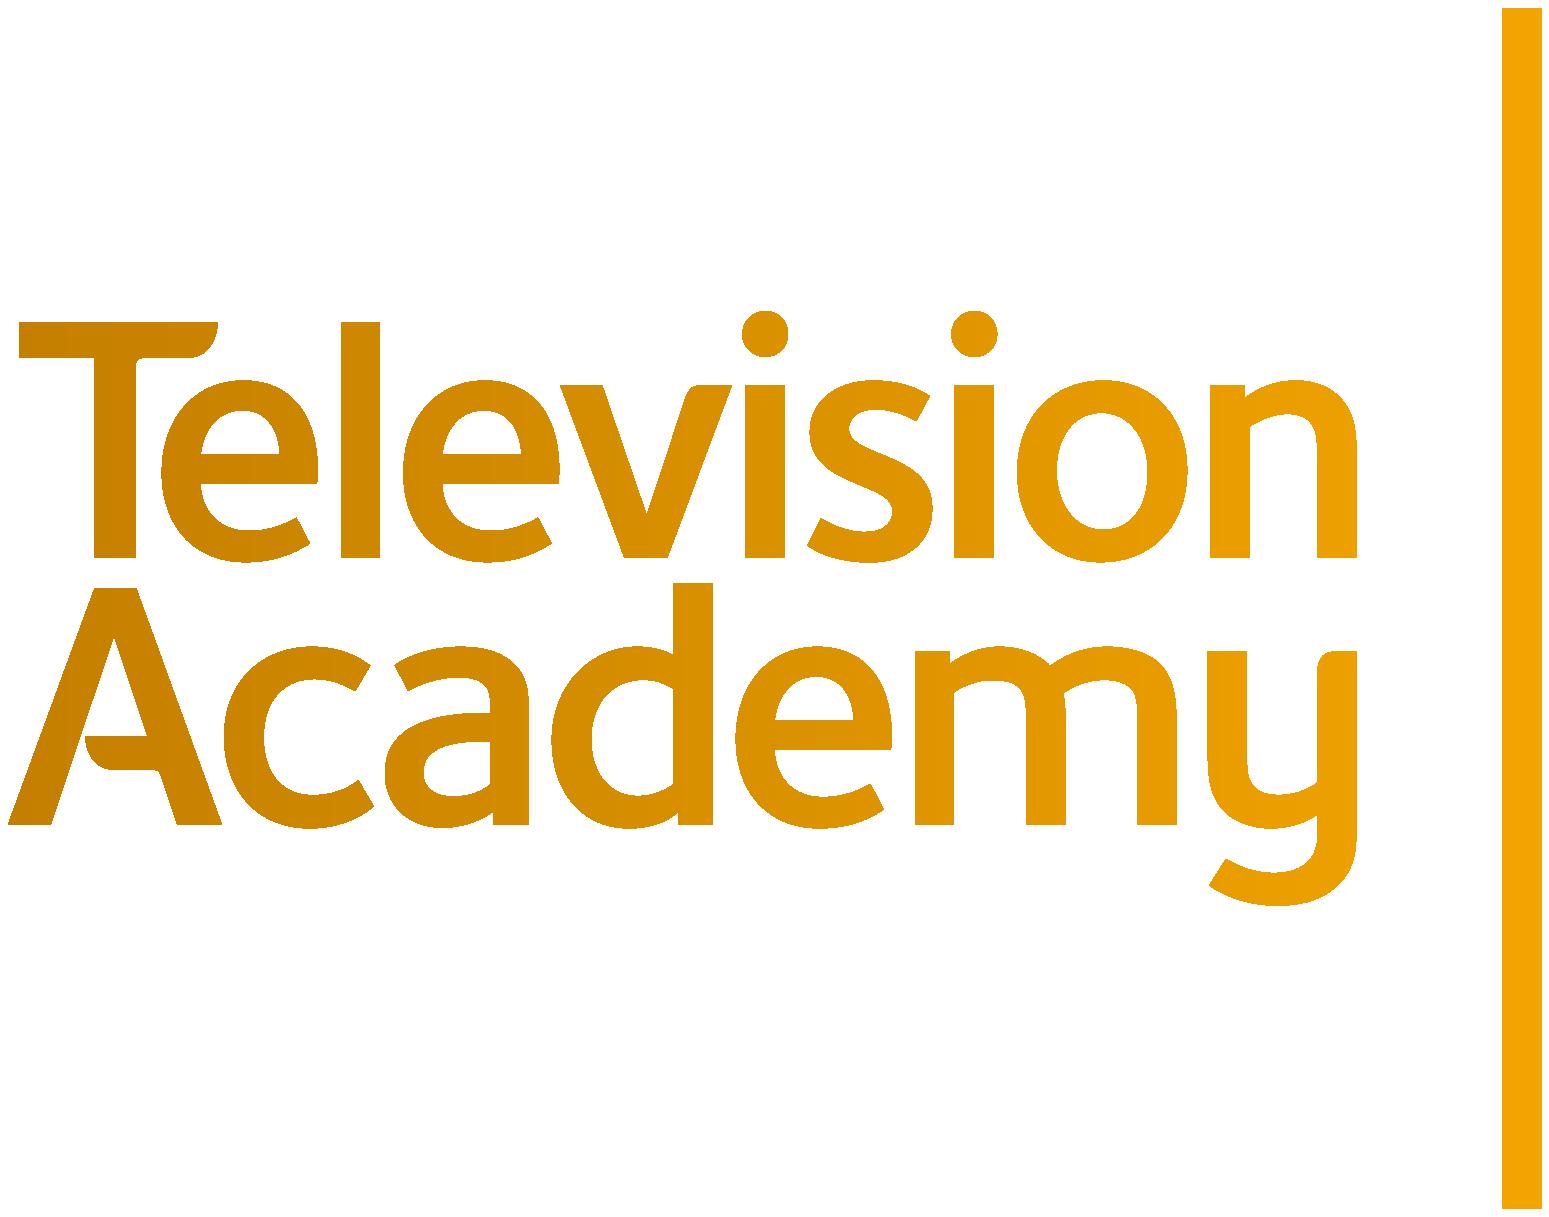 television academy. Black Bedroom Furniture Sets. Home Design Ideas